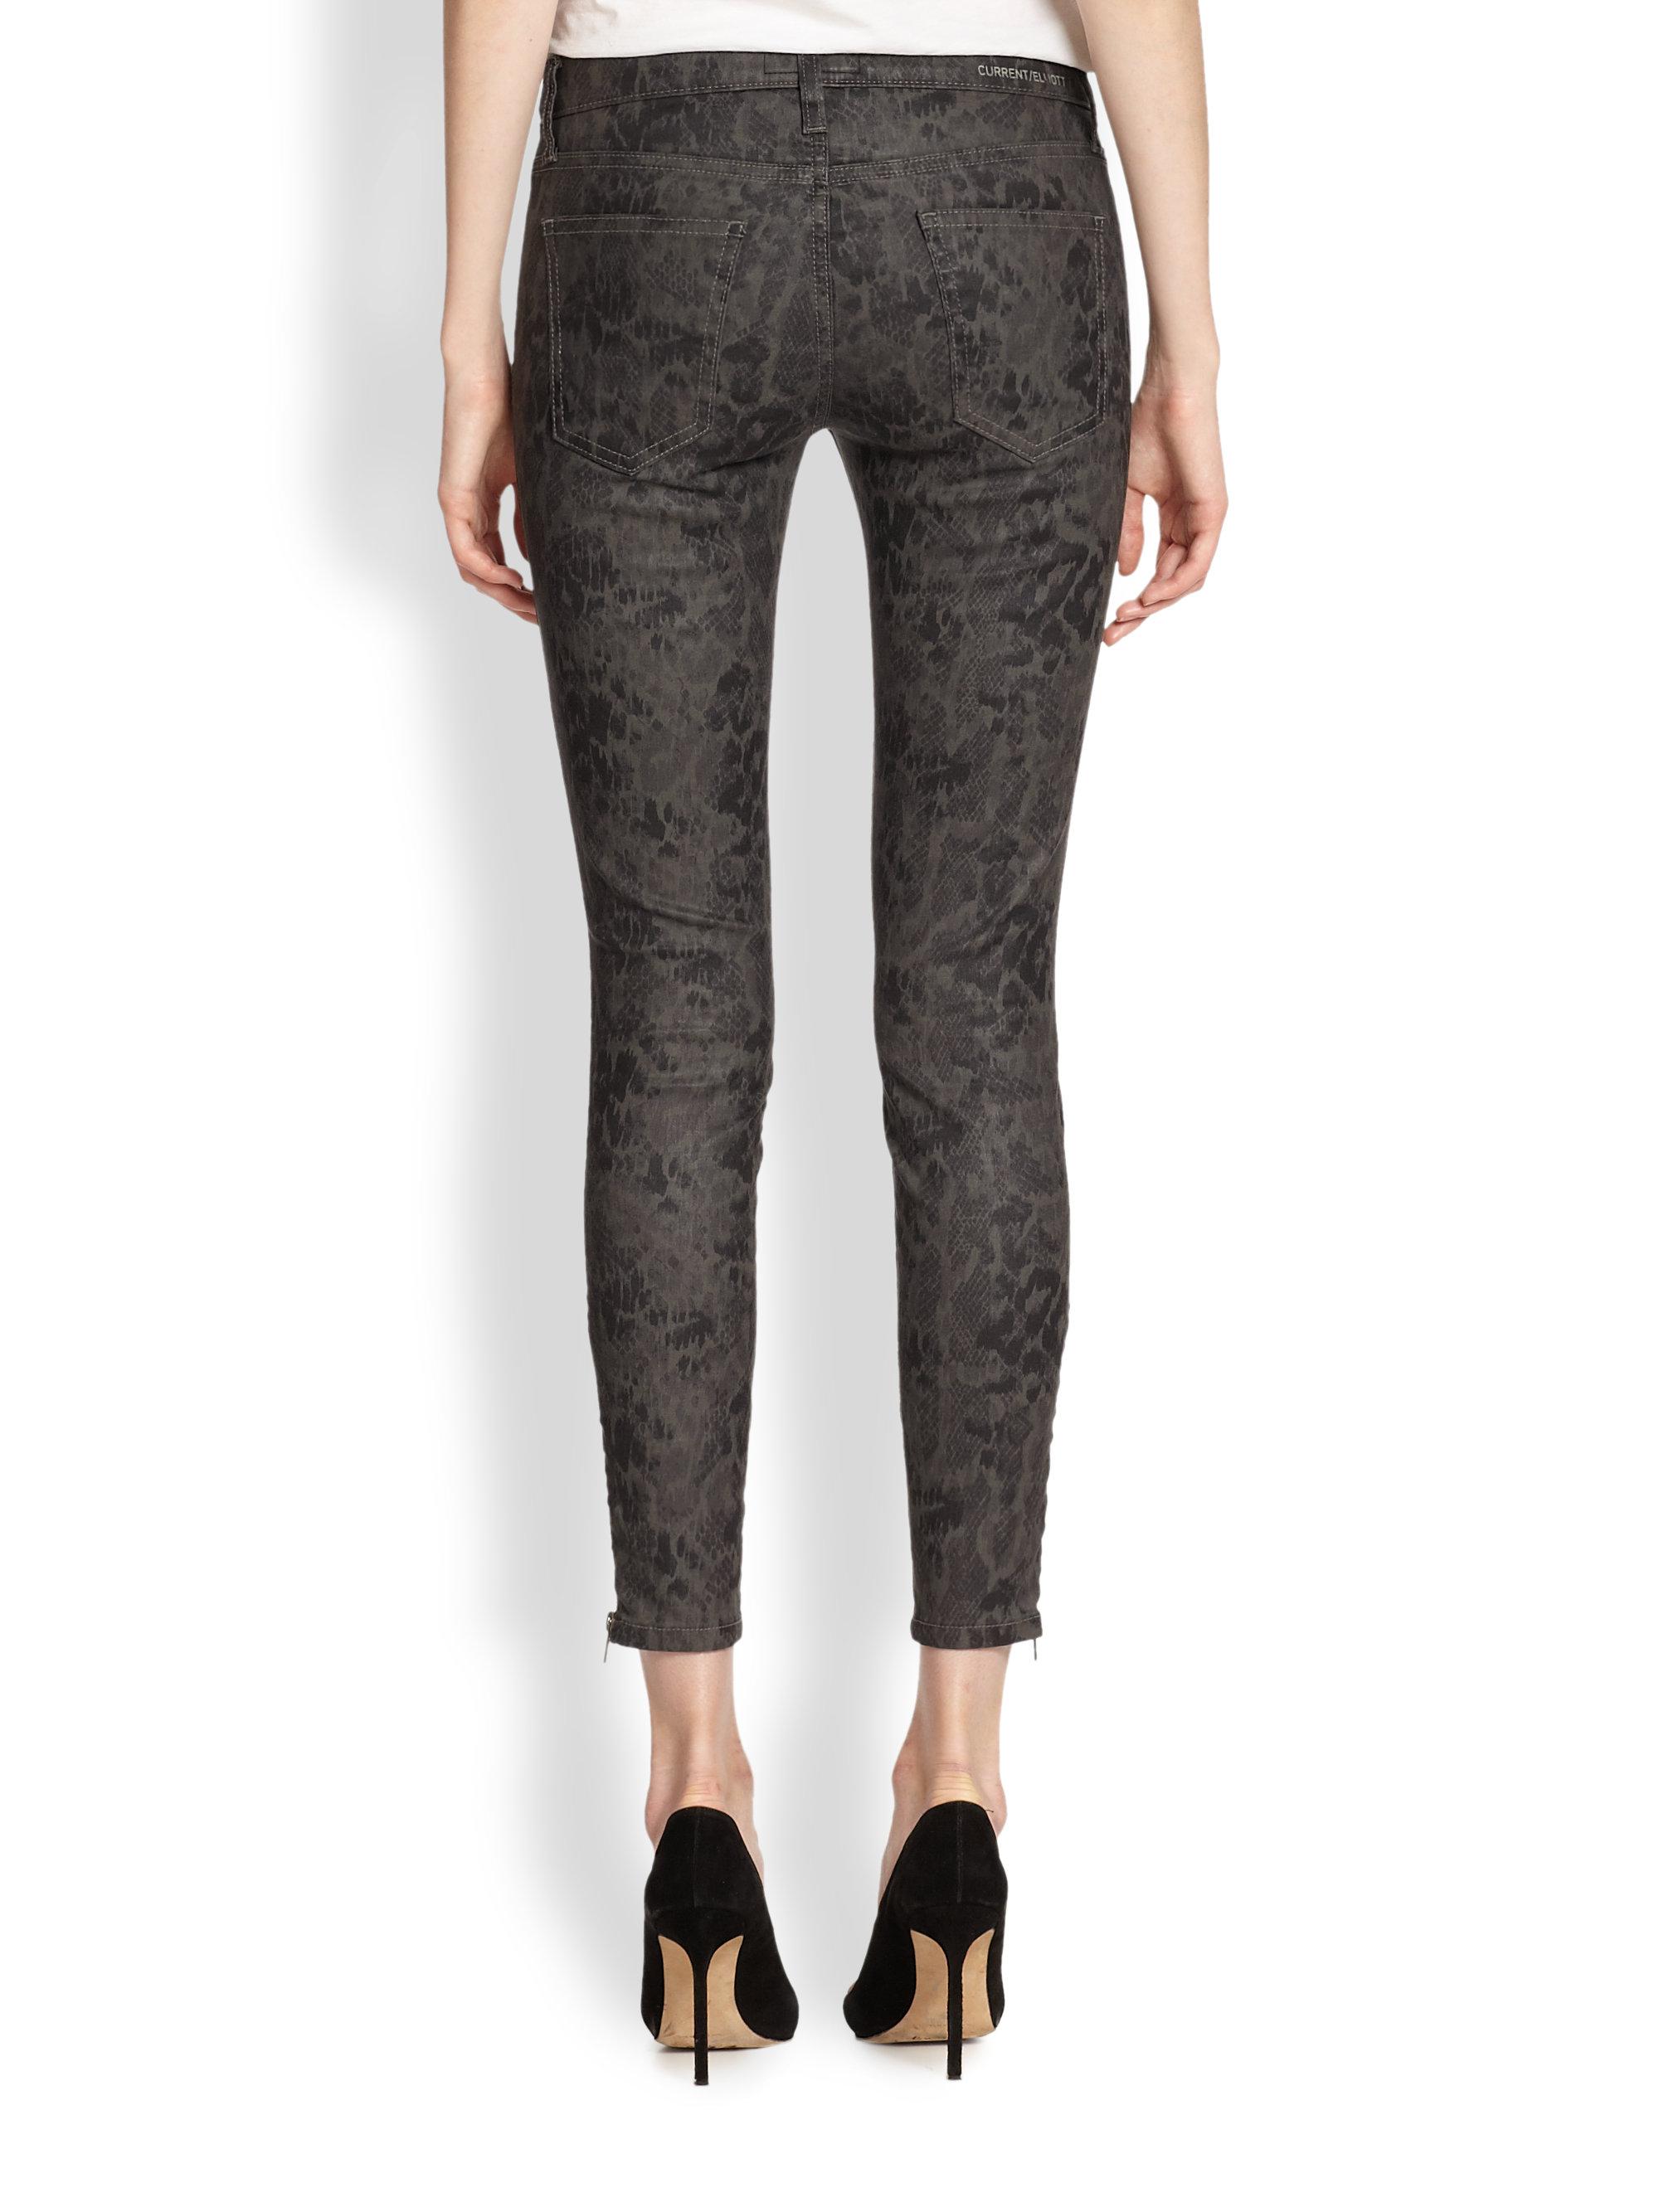 Sale Authentic Current/Elliott Mid-Rise Snake Print Jeans 100% Guaranteed Buy Cheap Manchester Great Sale bguSP